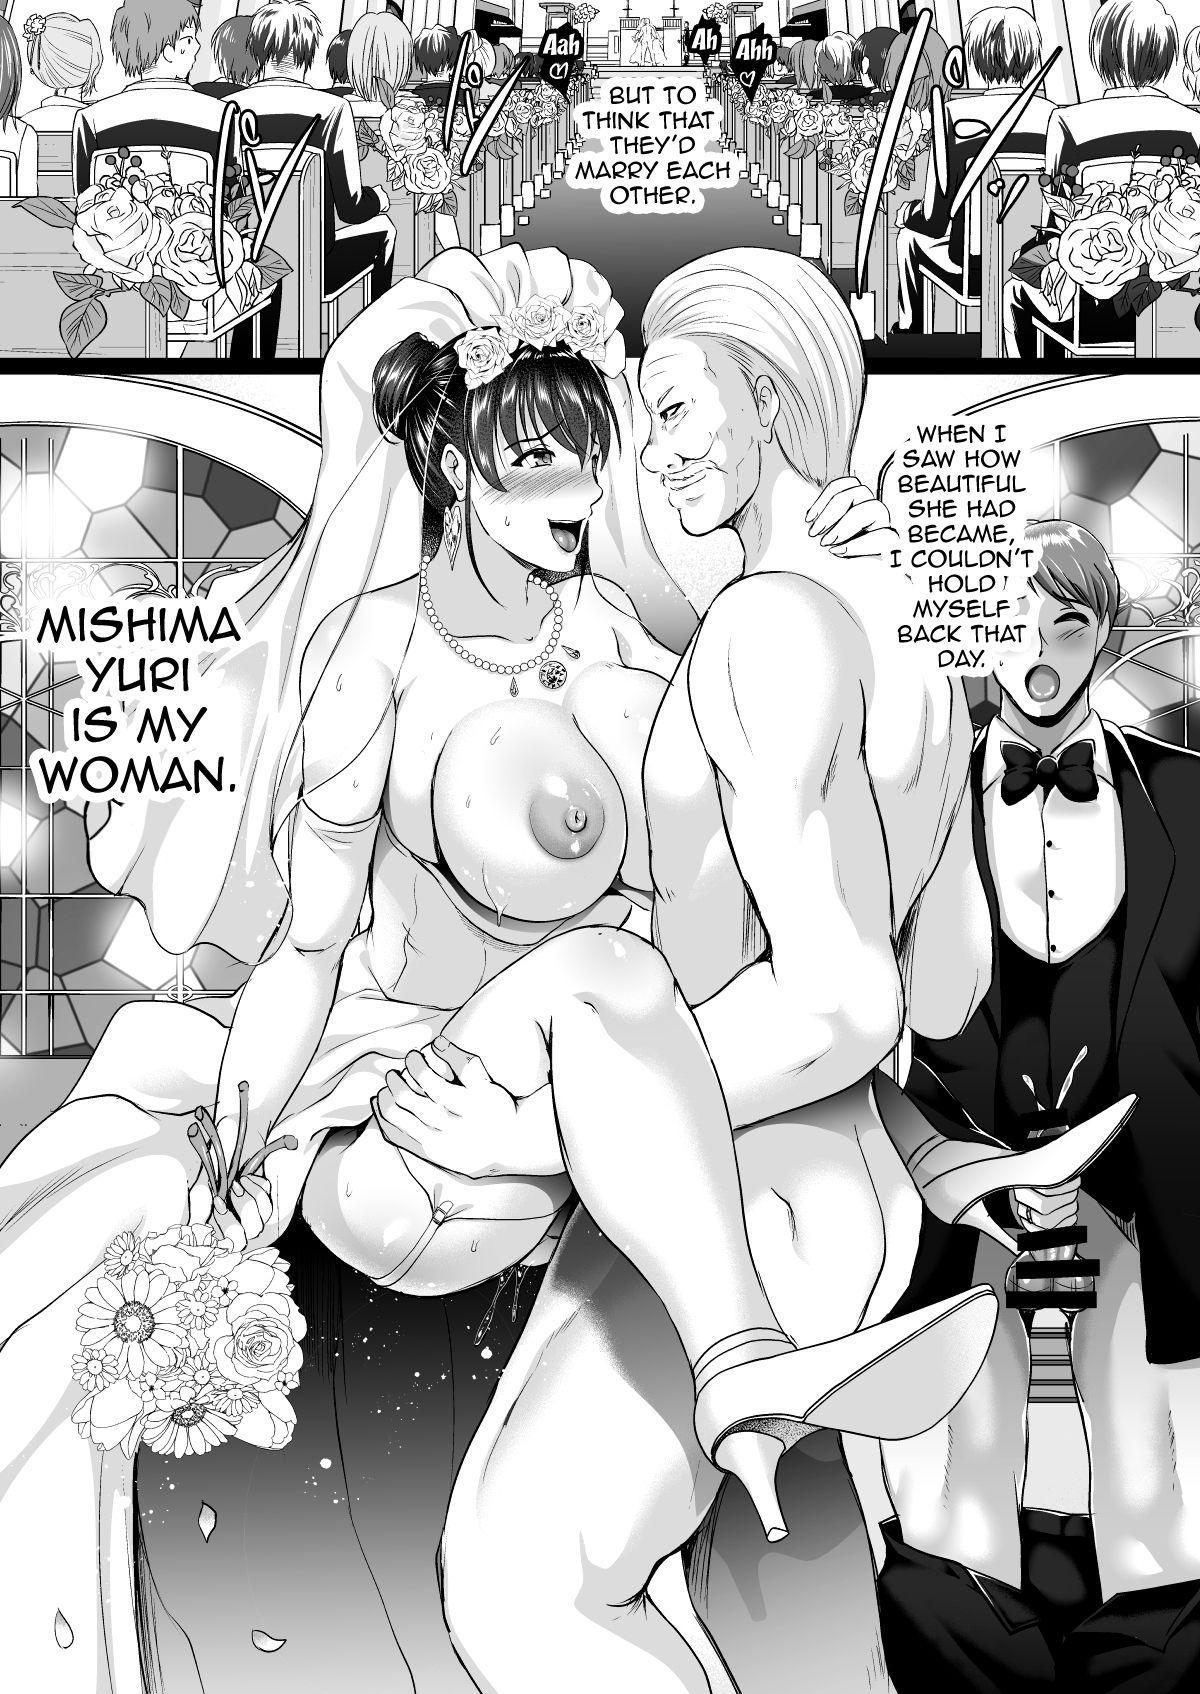 Saimin Fuufu Seikatsu - Hypnotism married life 24